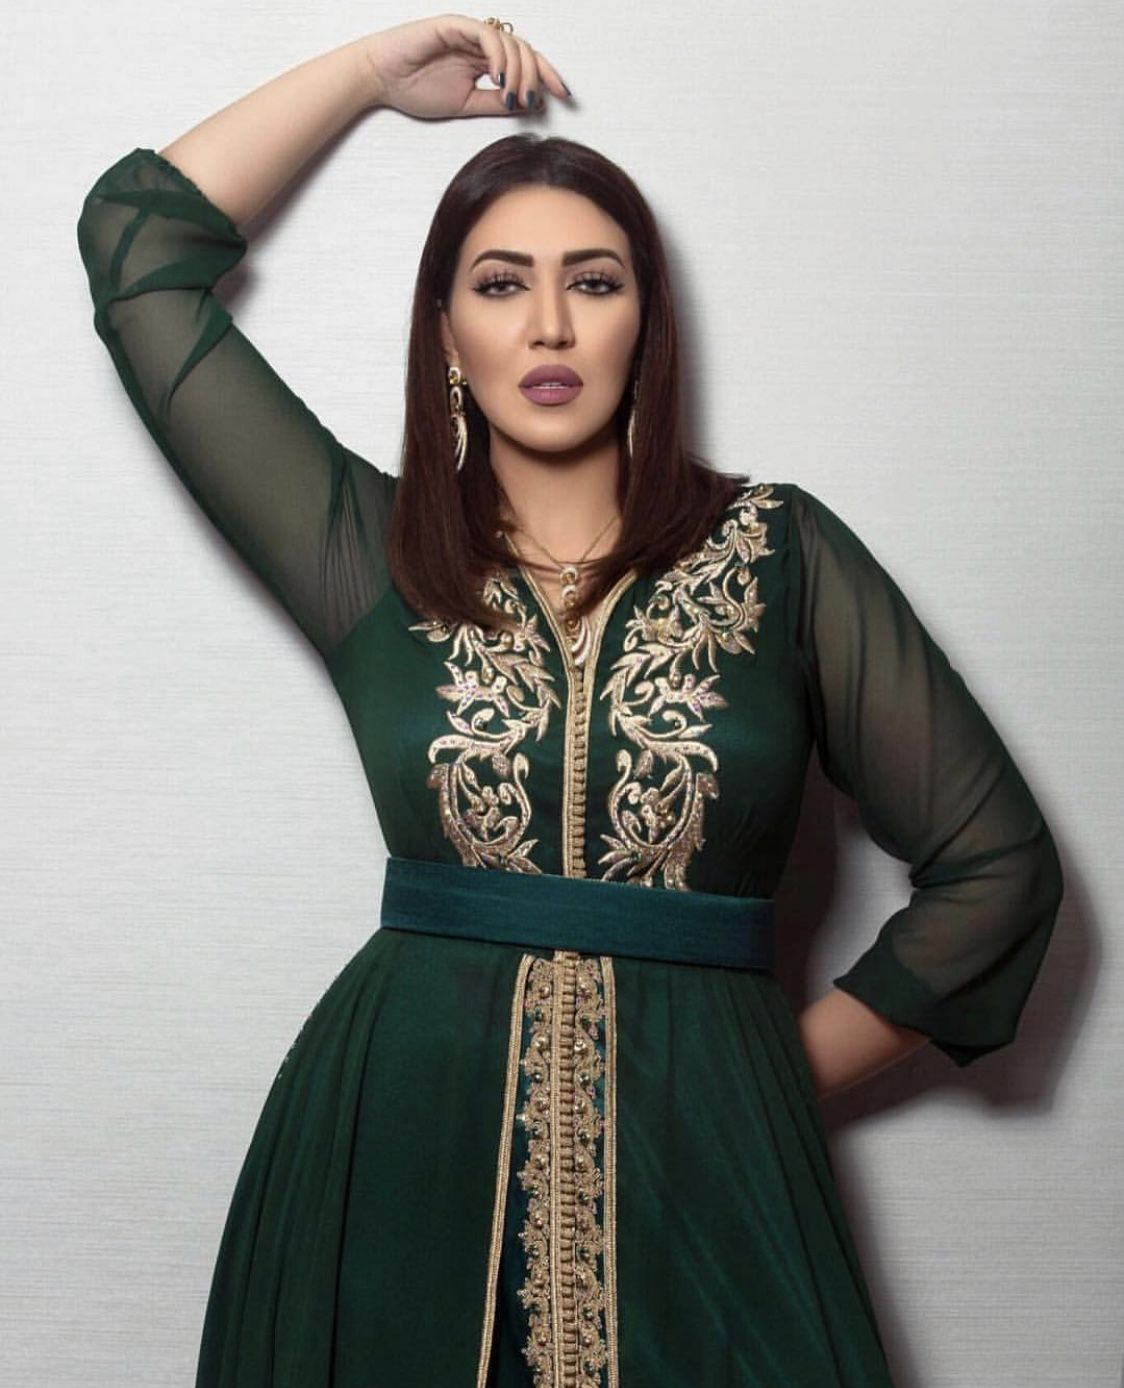 اسماء المنور بقفطان روميو Arab Fashion Moroccan Fashion Moroccan Dress